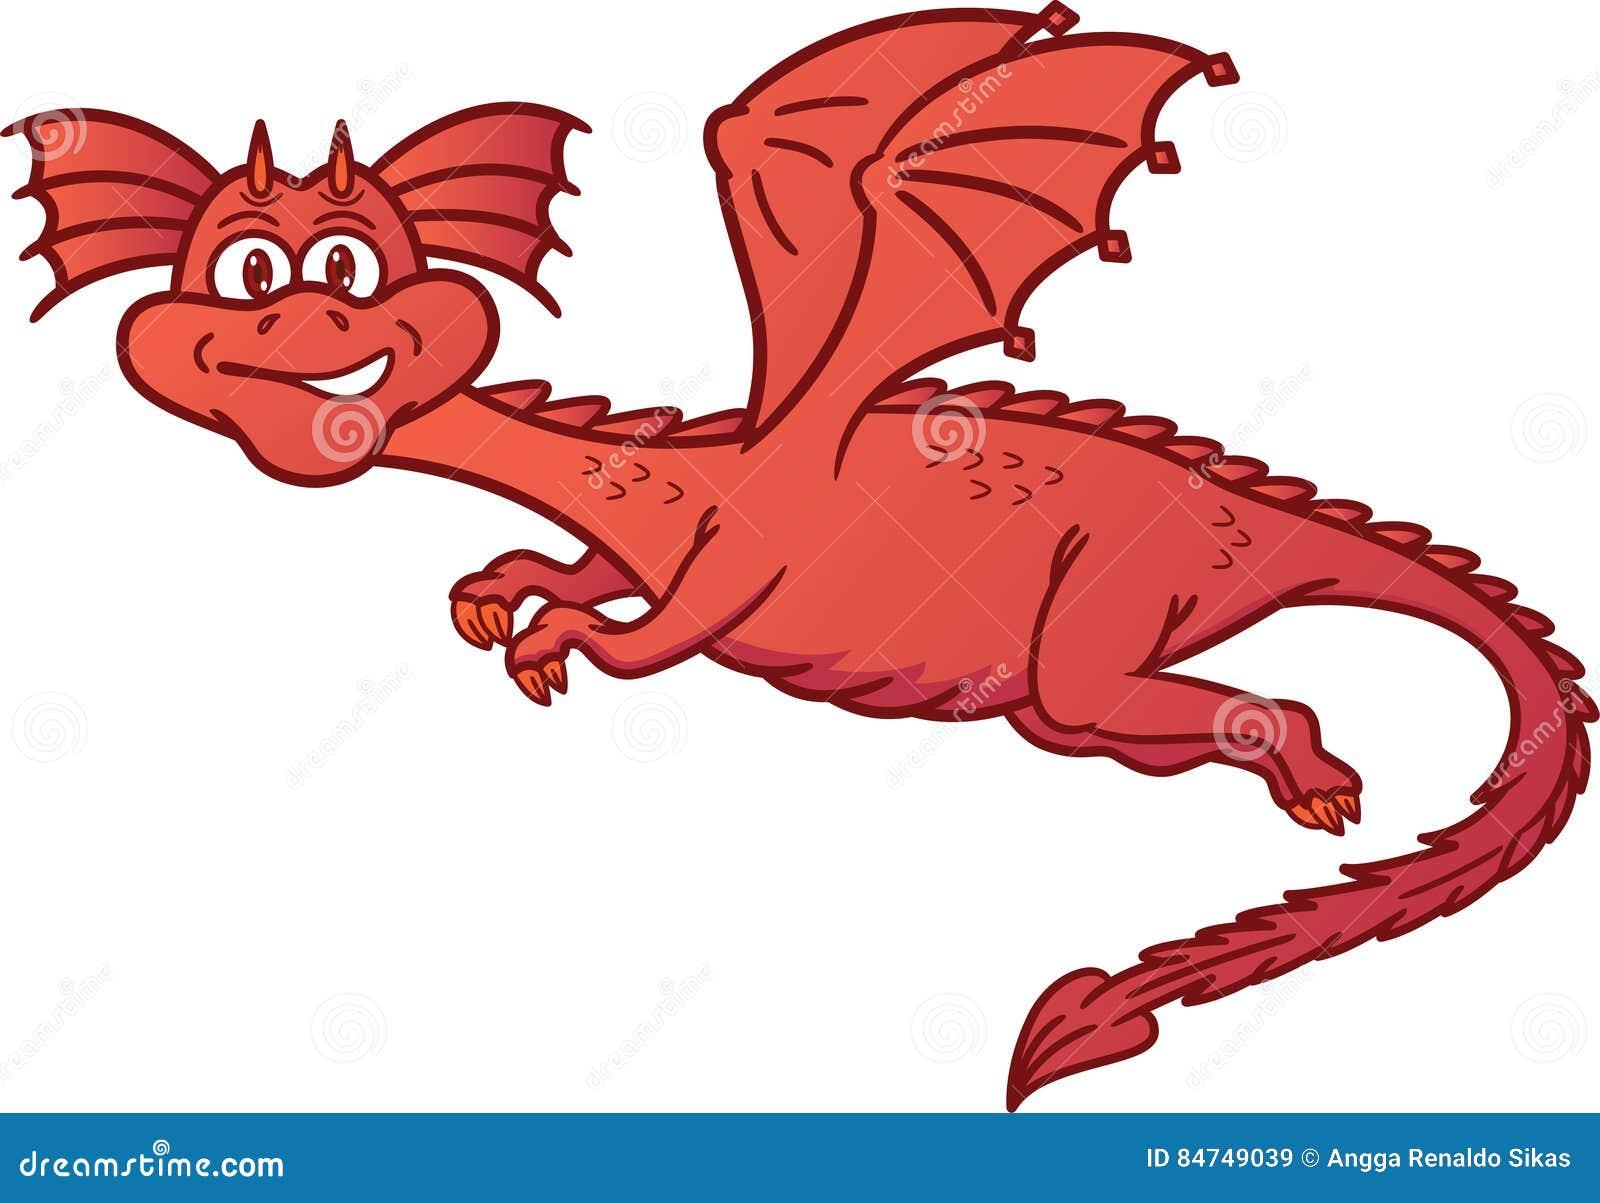 Dragon Flying Cartoon